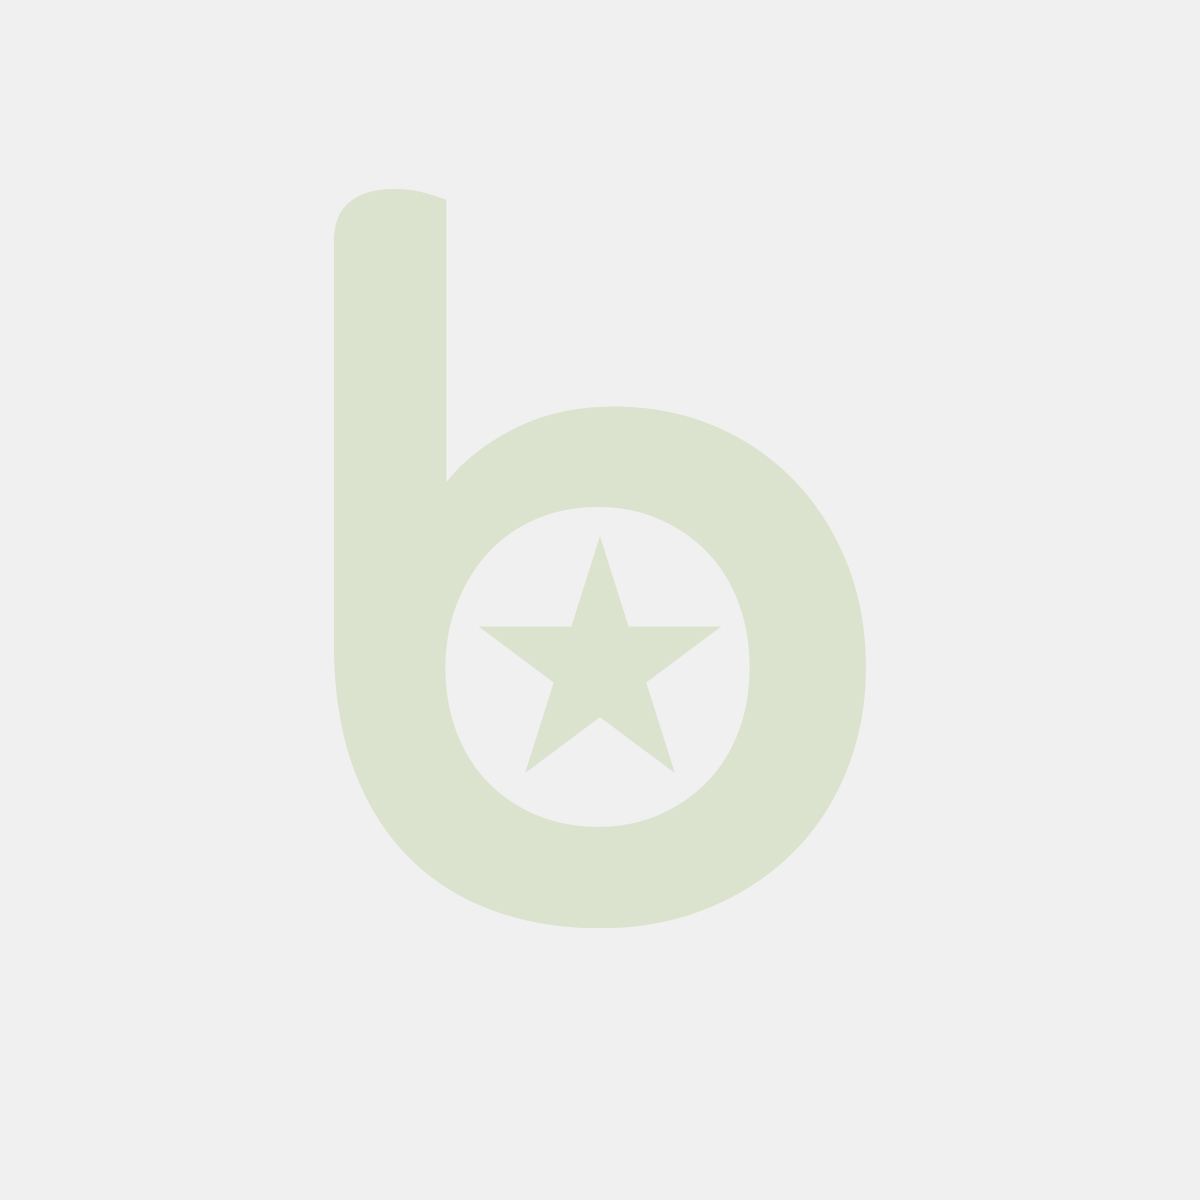 Pojemnik Gn 1/3 - 325X176 Mm 150